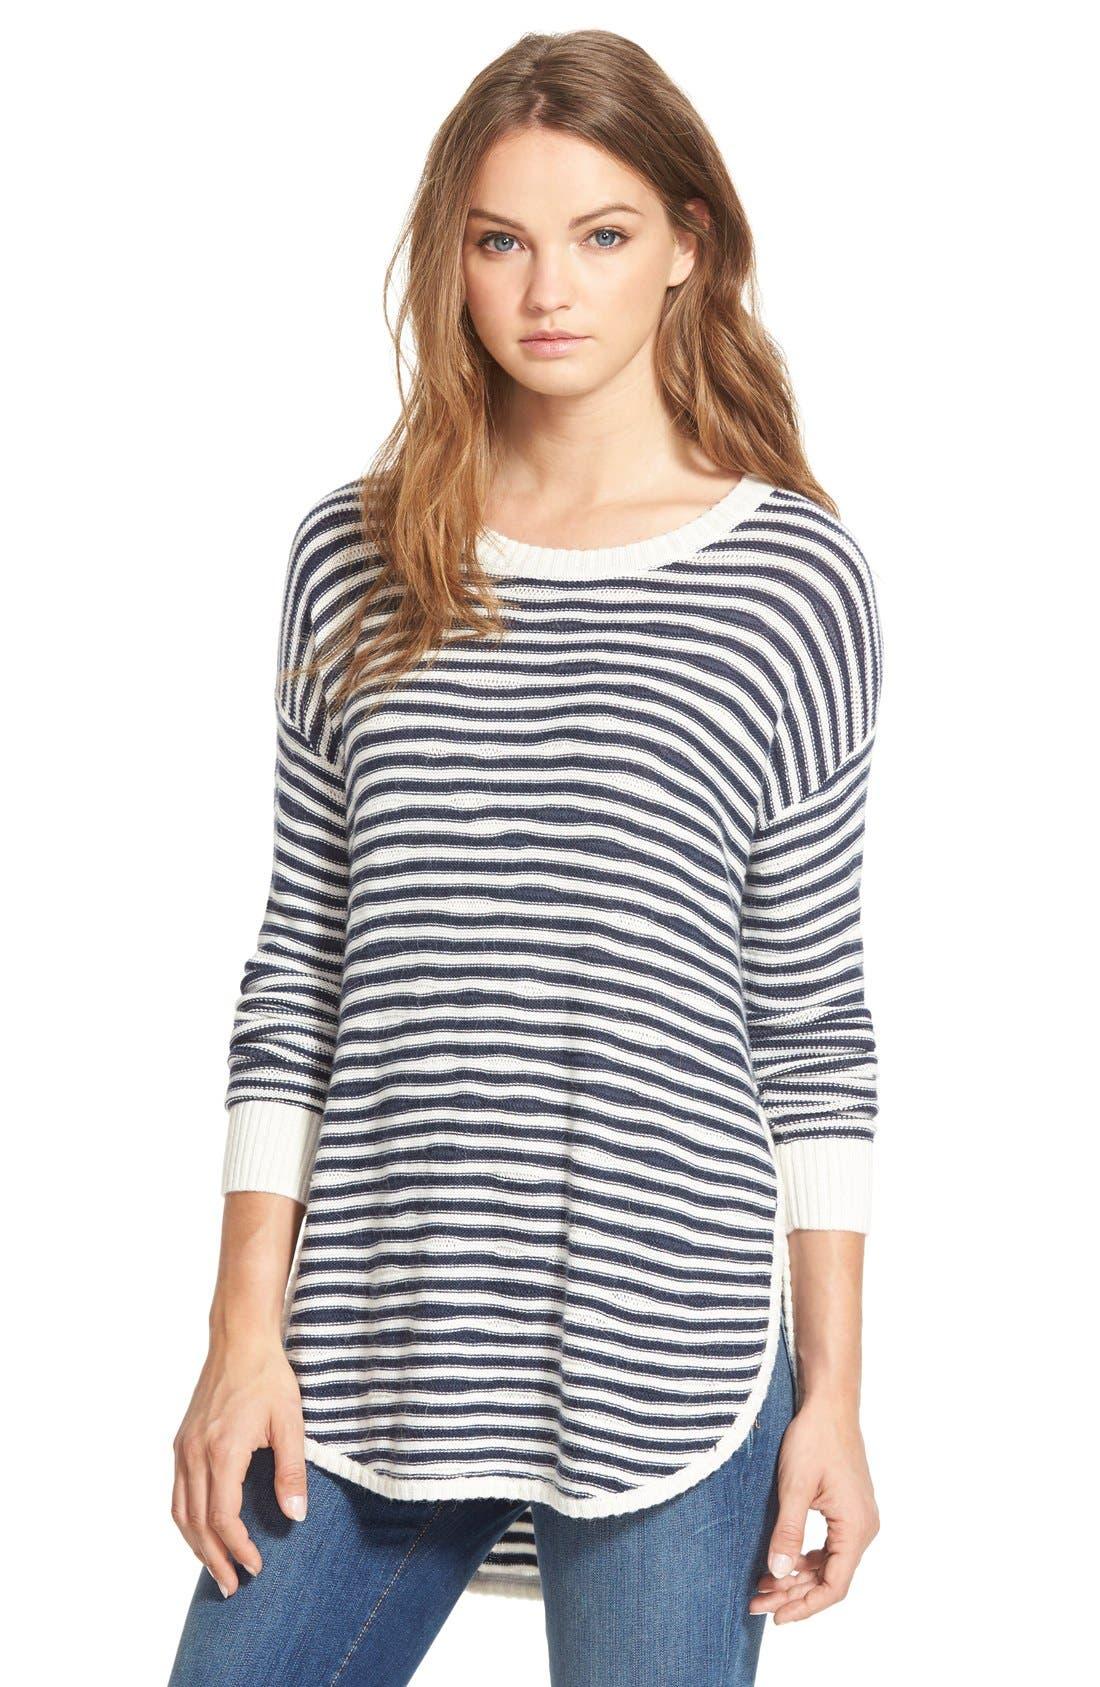 TREASURE & BOND Treasure&Bond Asymmetrical Stripe Sweater, Main, color, 400